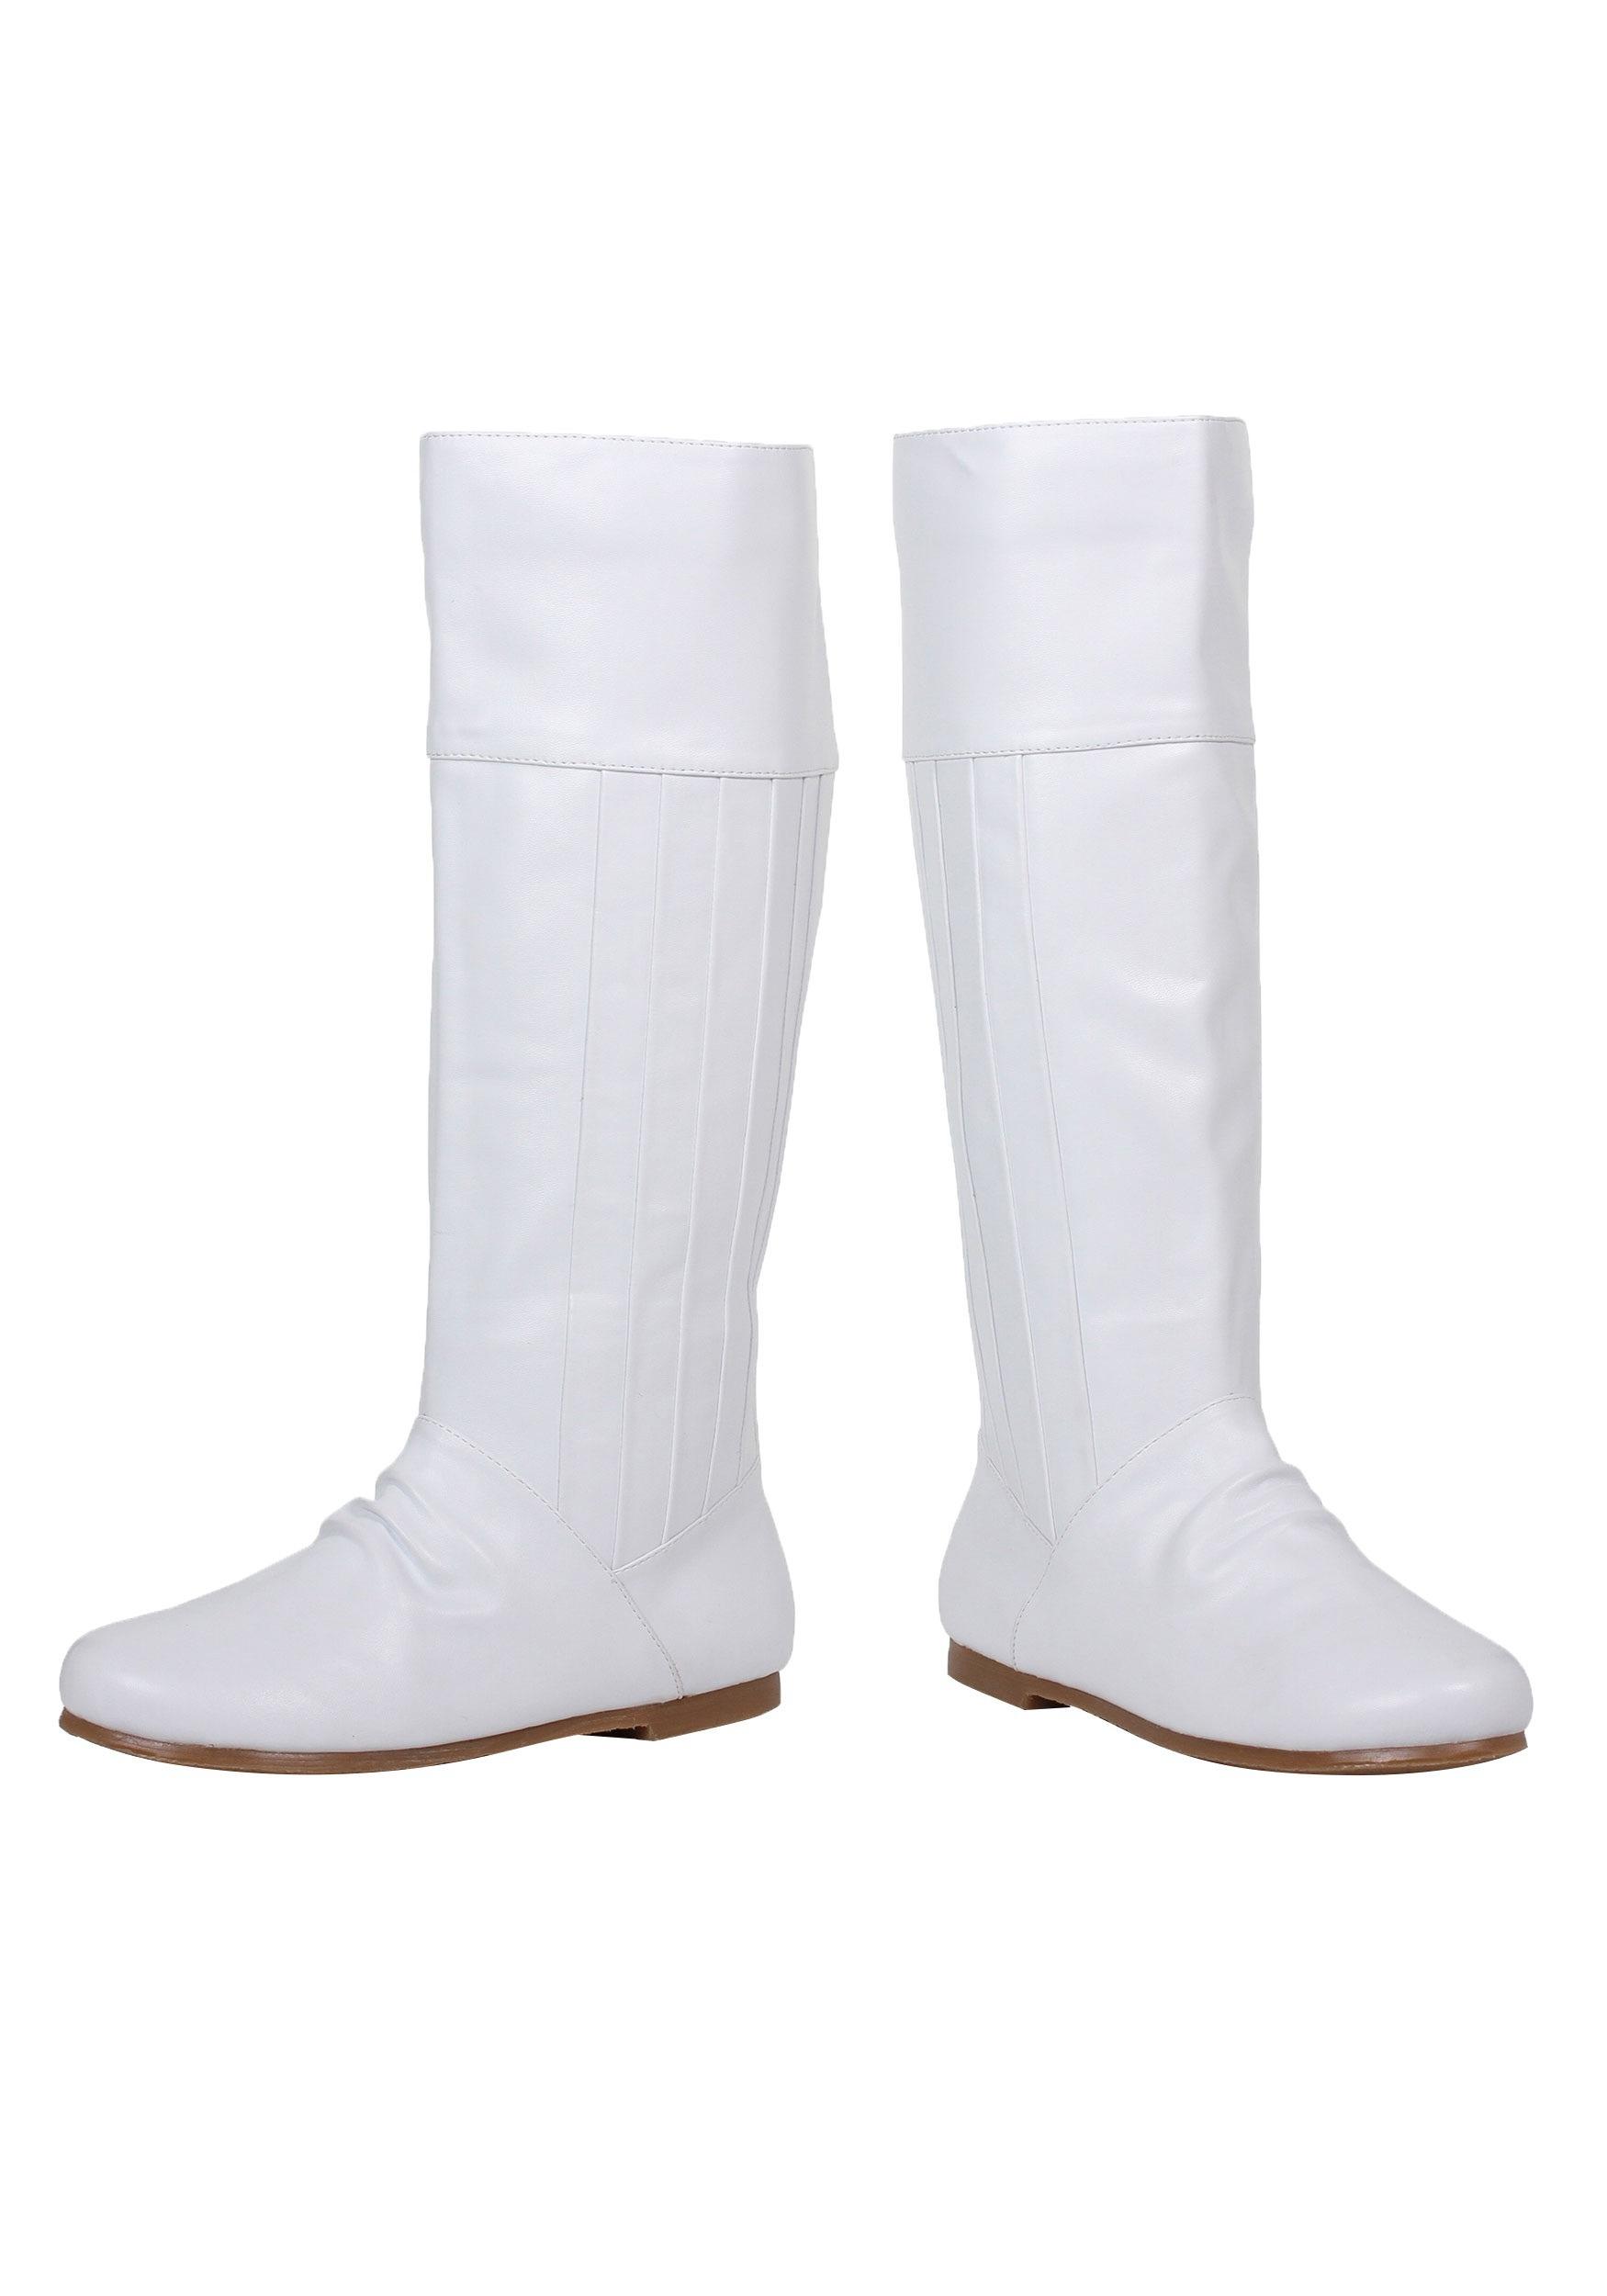 white boots white princess boots eoildpv